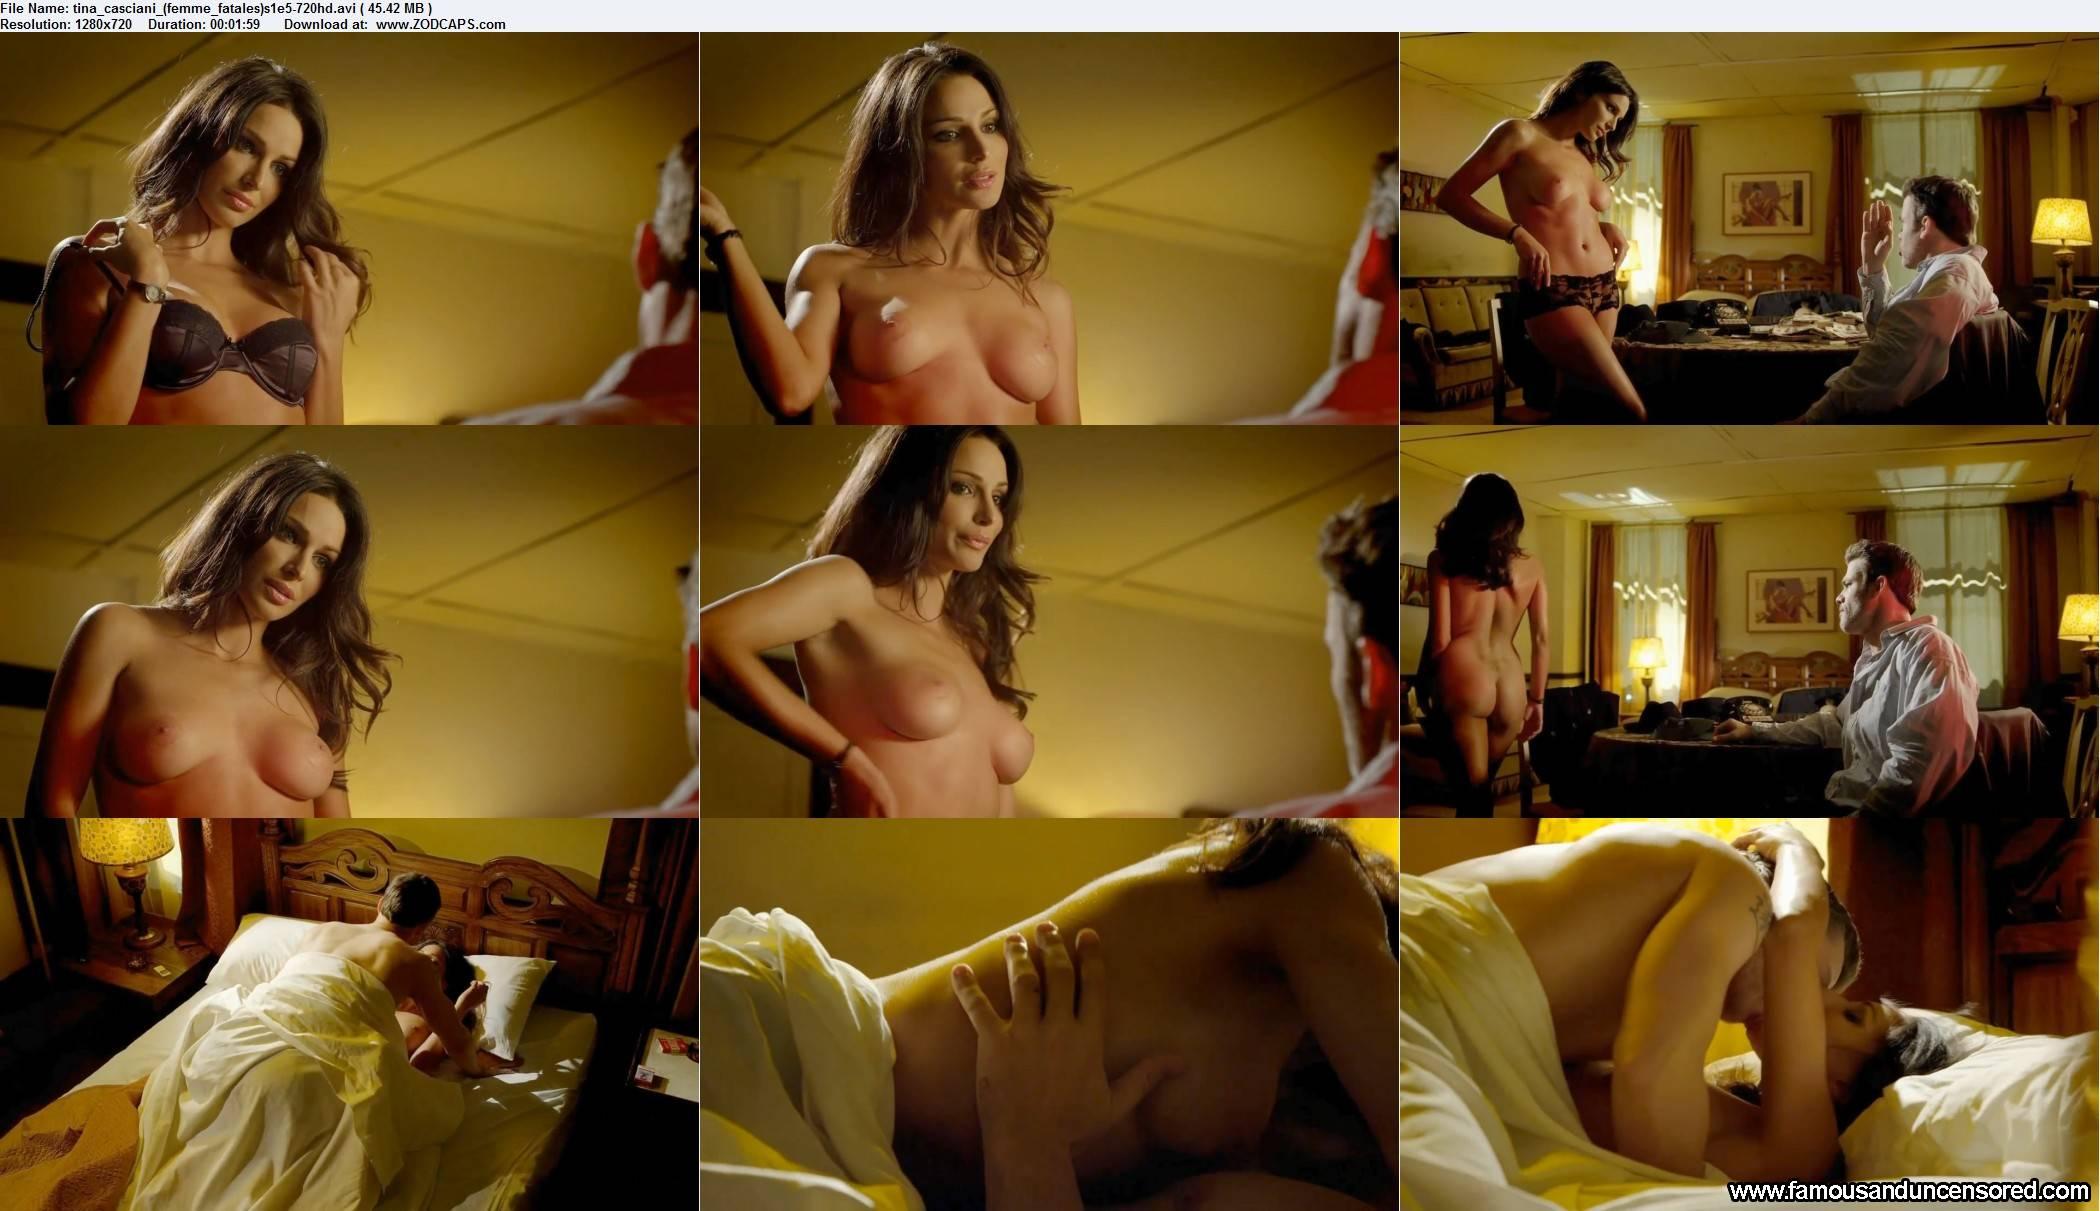 Double dildo free video trailer XXX sex photos